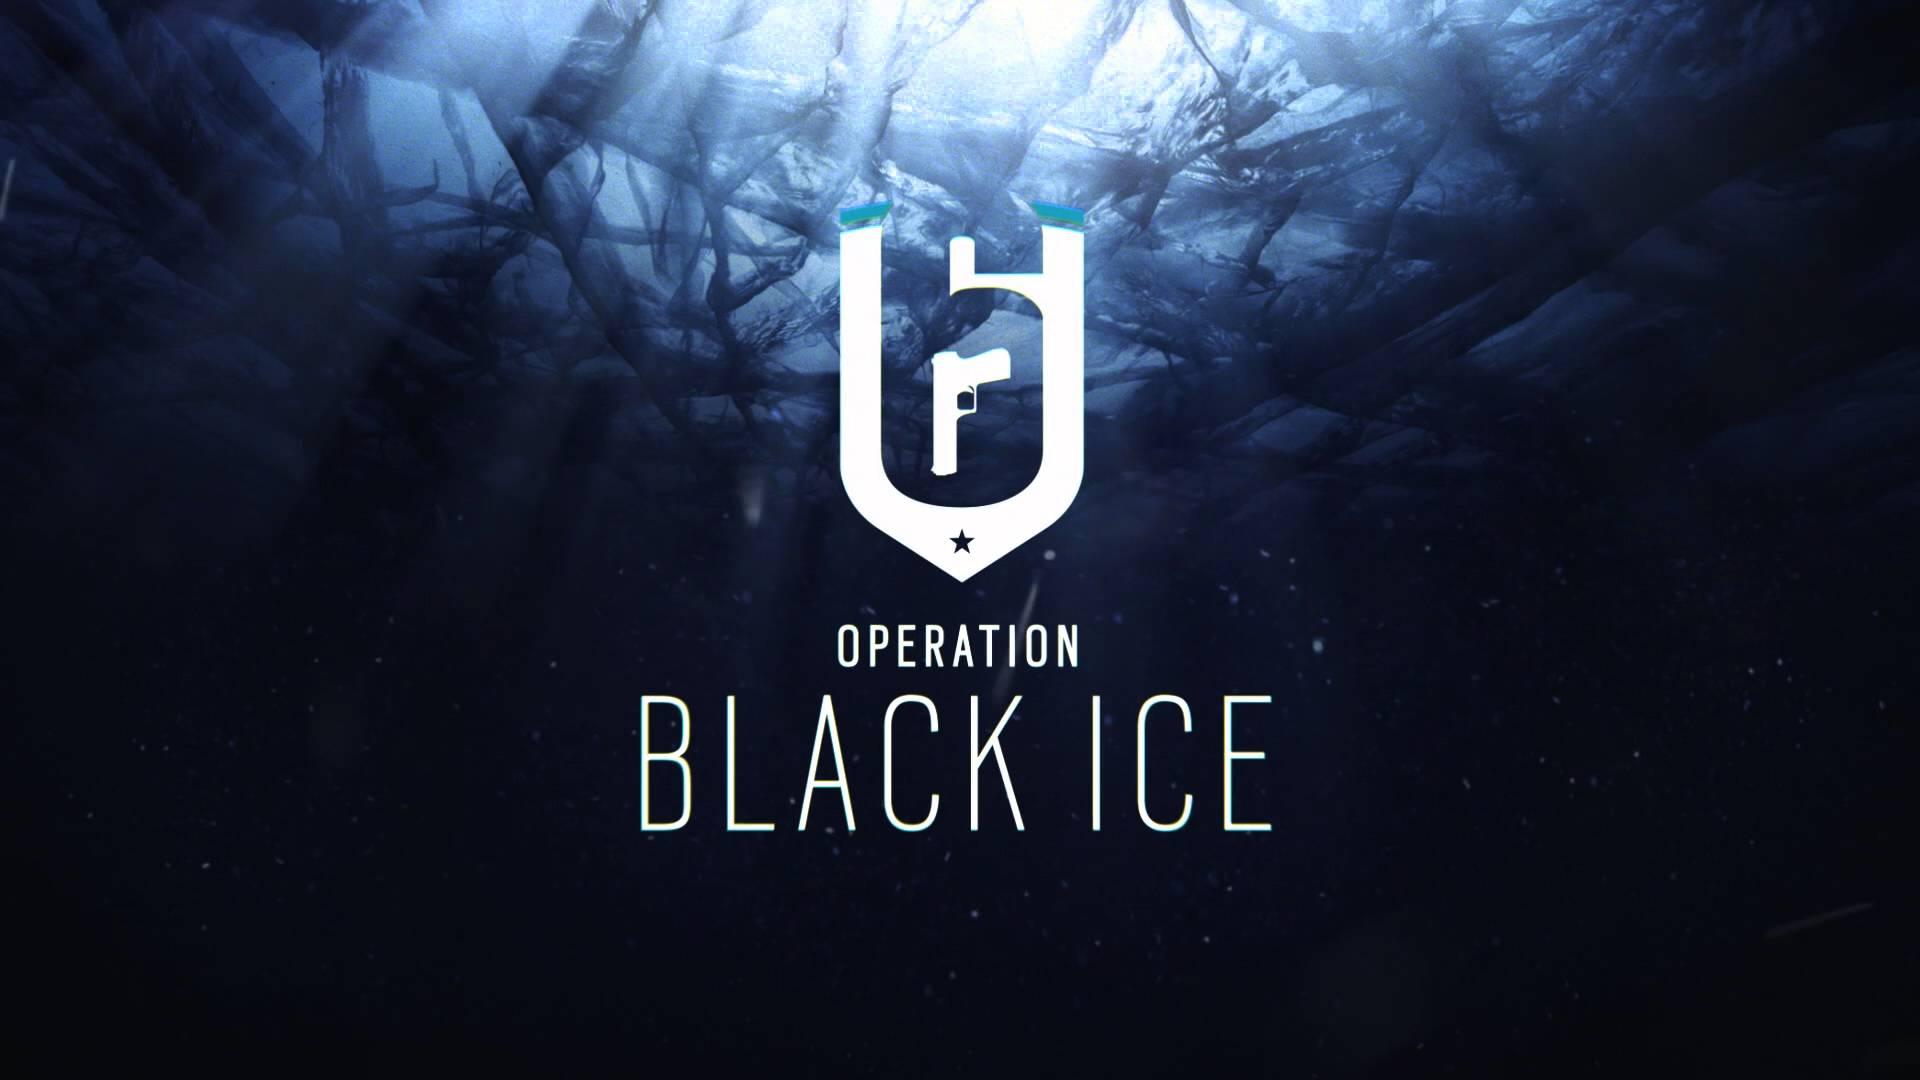 Steam Community Rainbow Six Siege Operation Black Ice 1920x1080